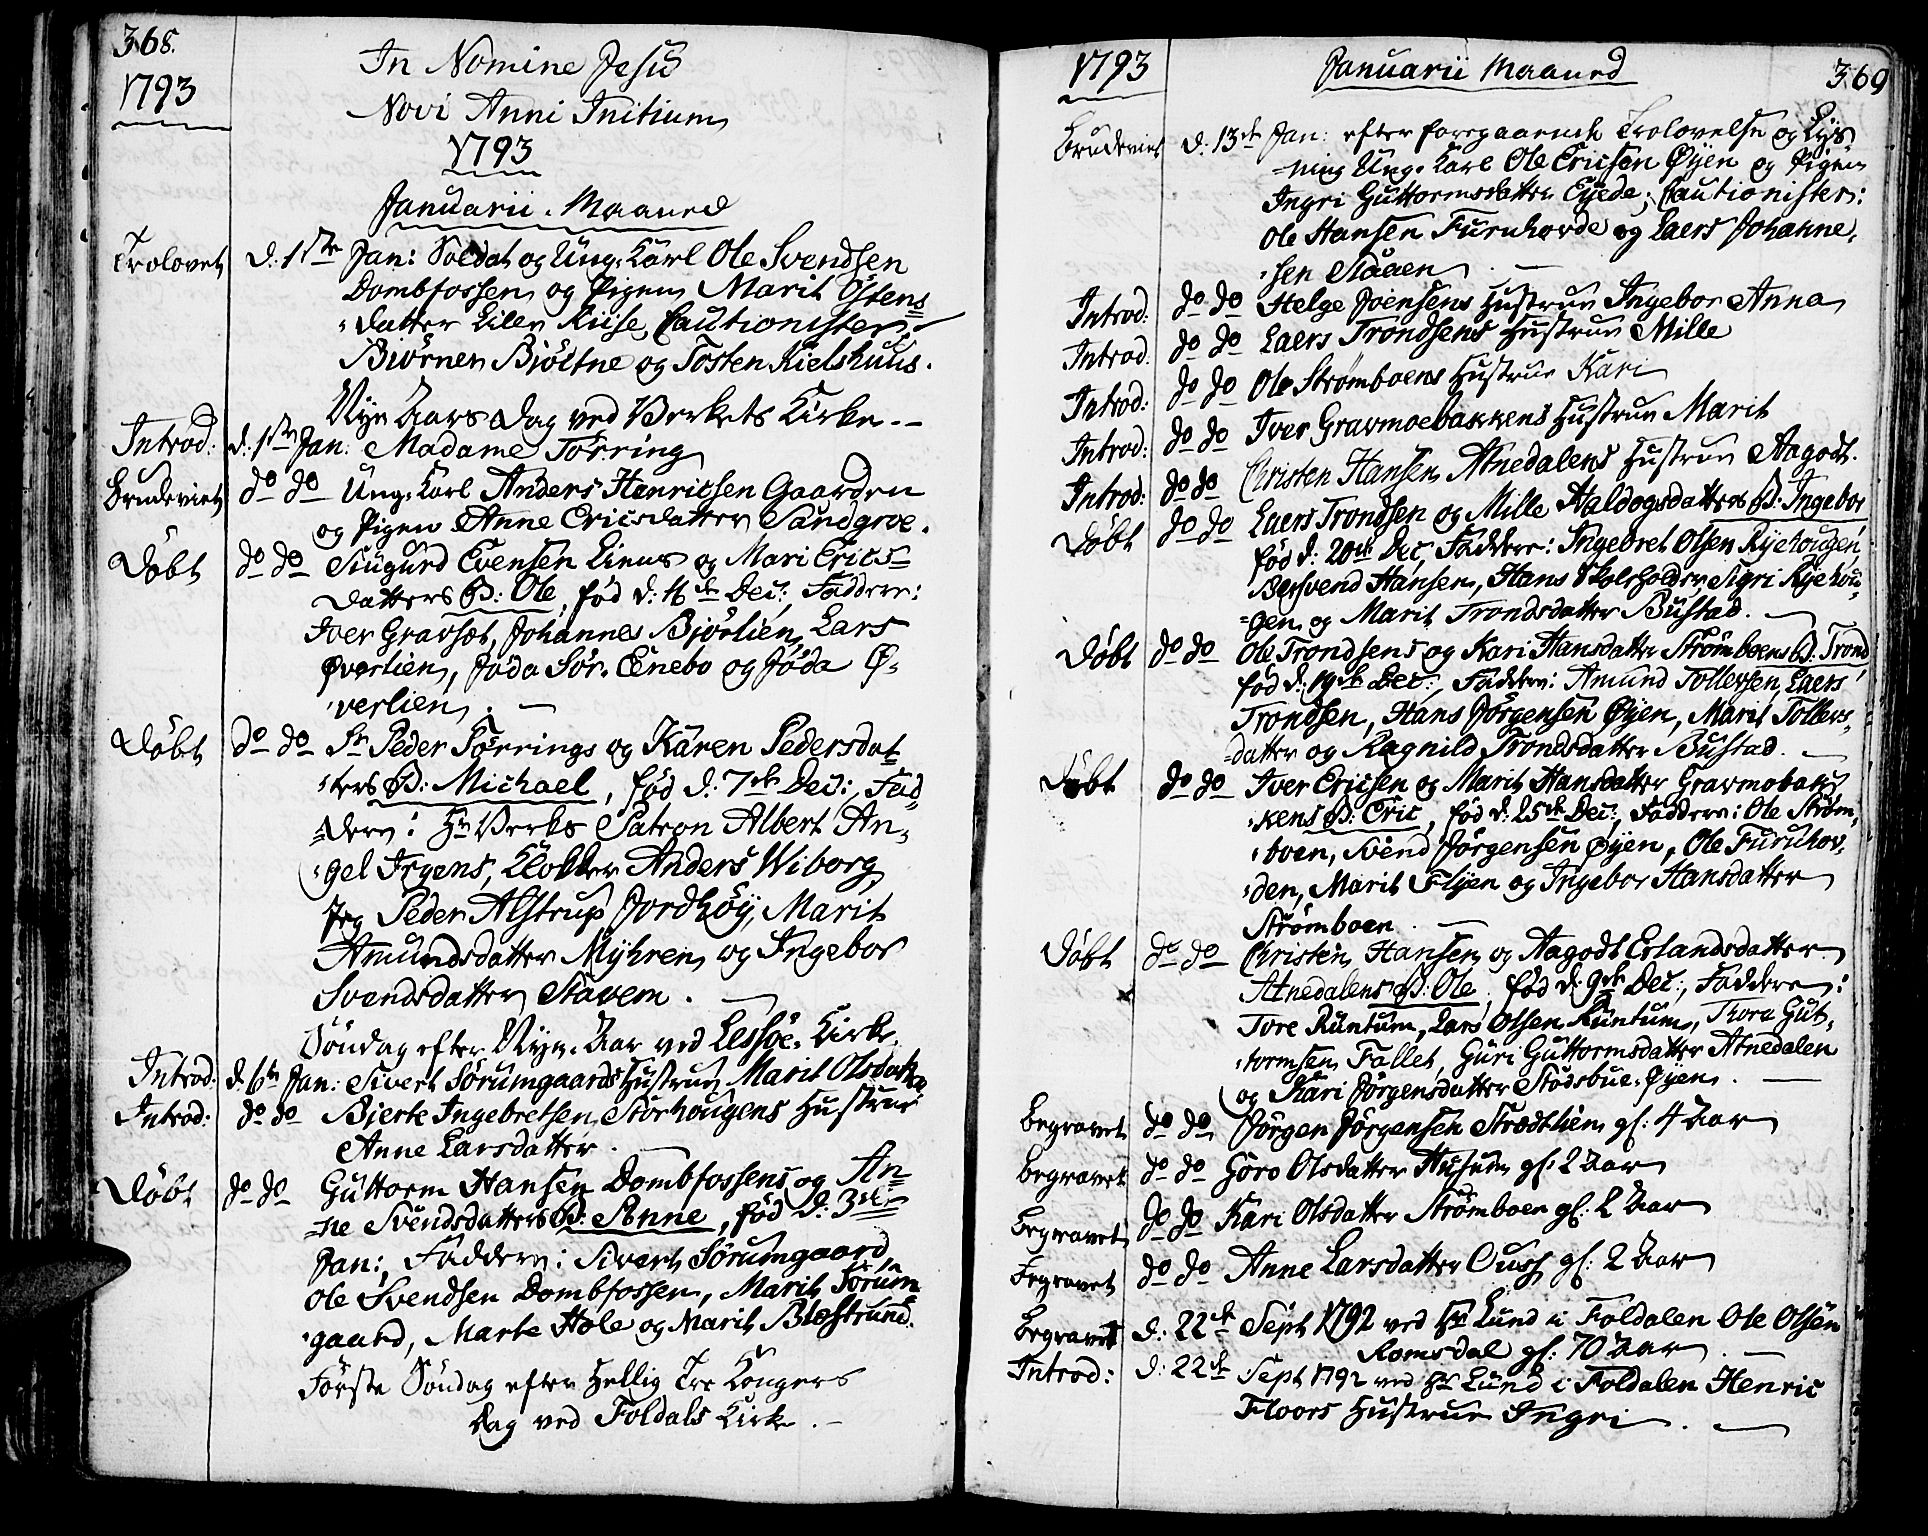 SAH, Lesja prestekontor, Ministerialbok nr. 3, 1777-1819, s. 368-369